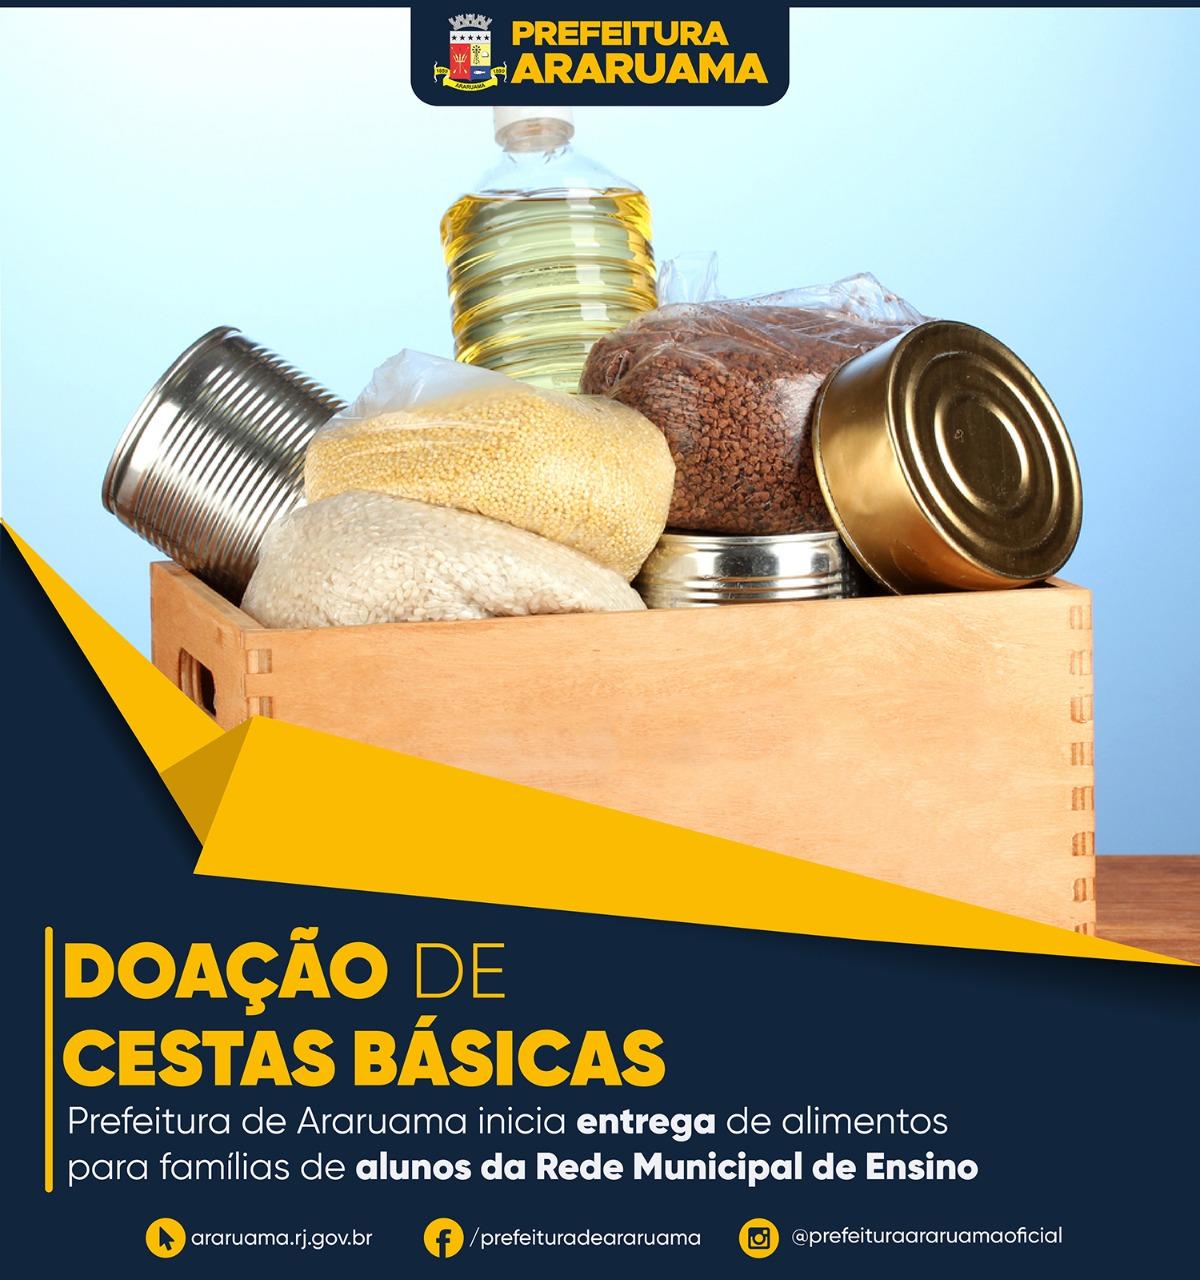 Prefeitura de Araruama vai realizar segunda etapa de entrega de cestas básicas para famílias de alunos da rede municipal